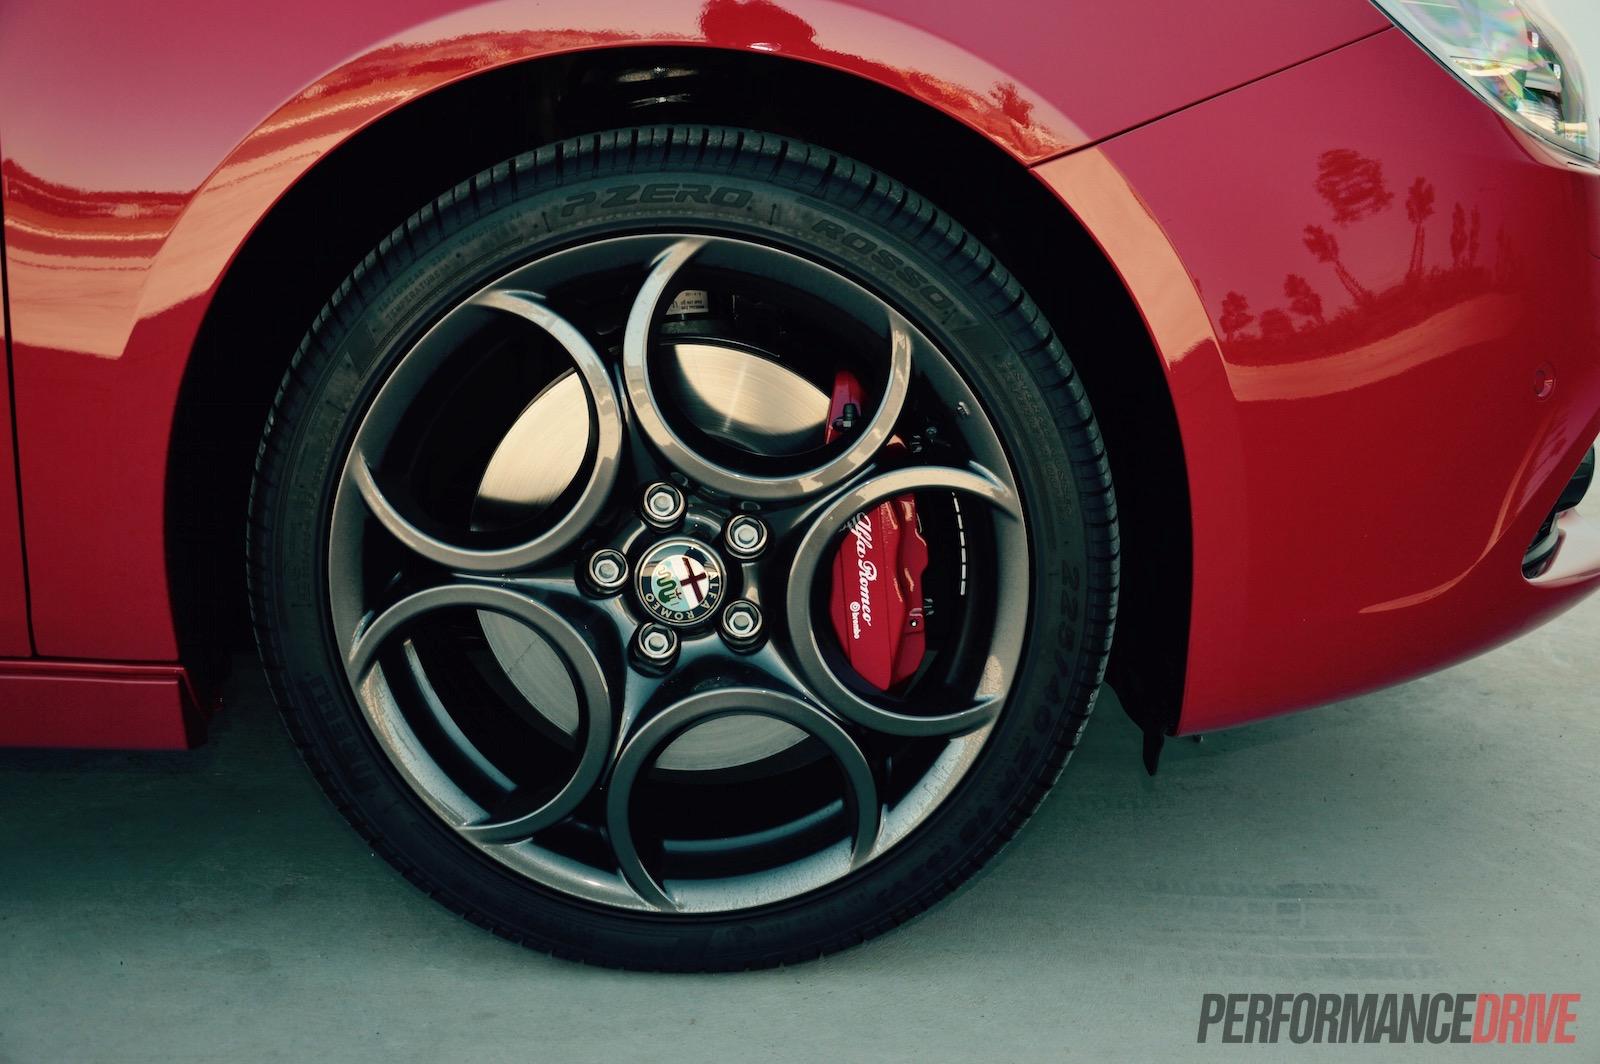 2015 Alfa Romeo Giulietta Qv Review Video Performancedrive Wheels 18in